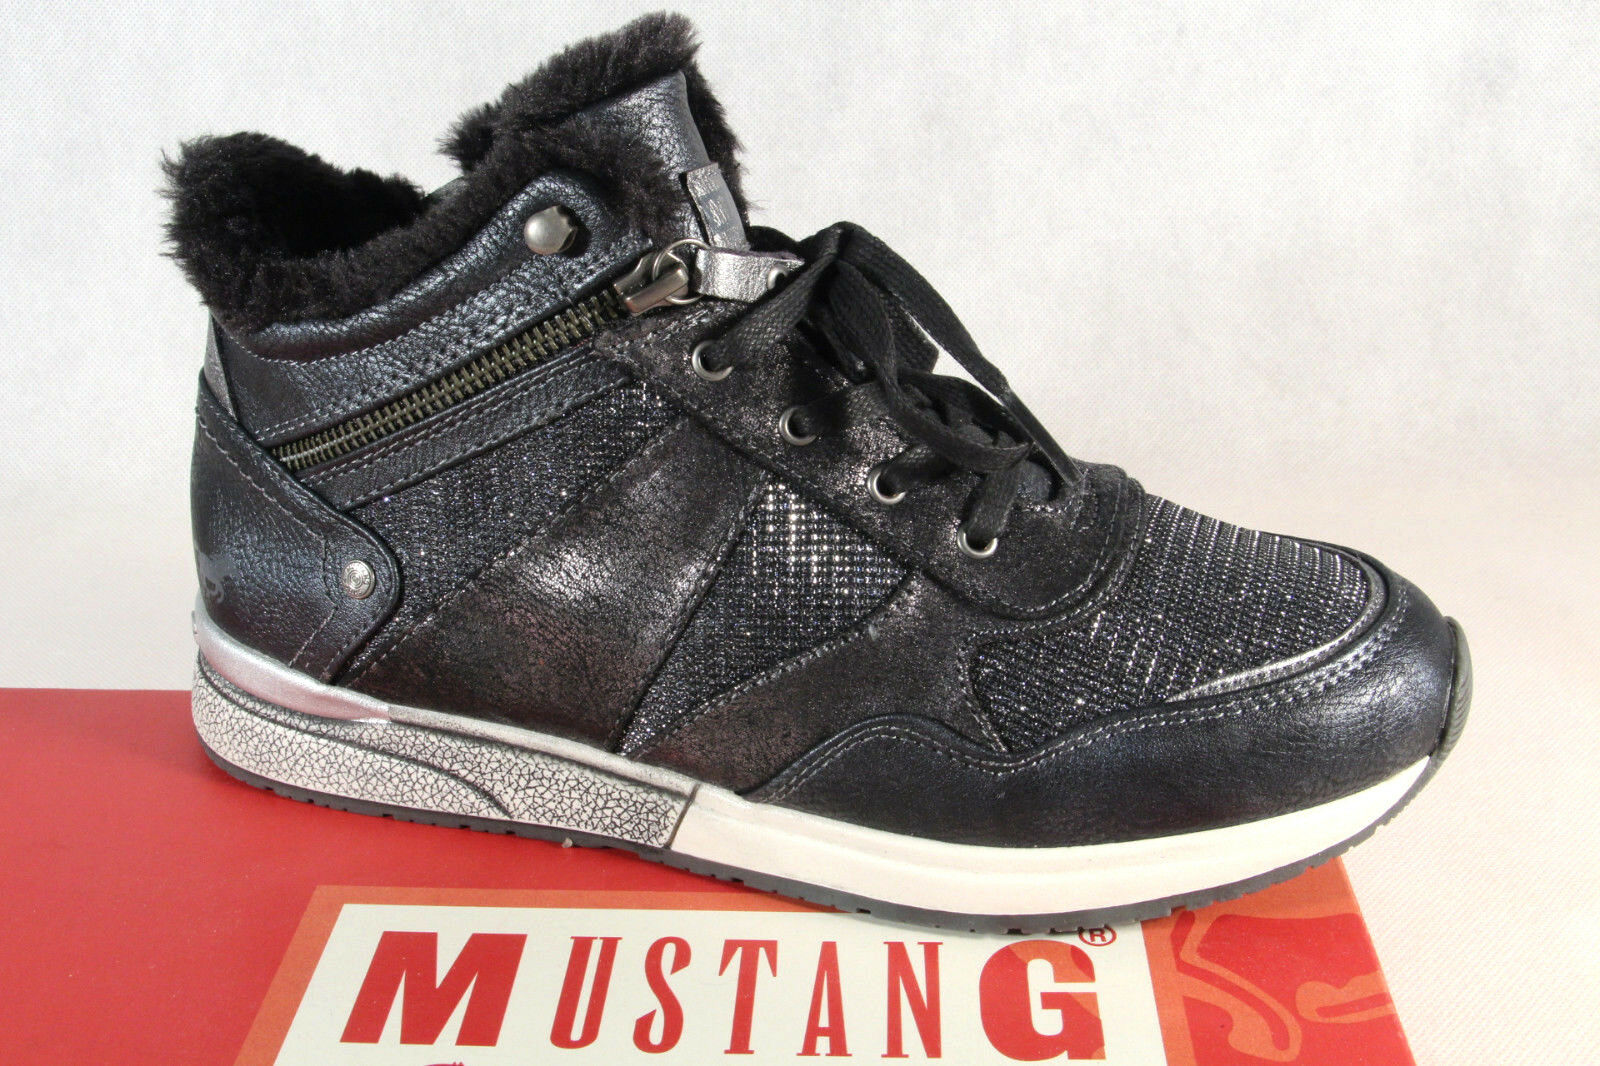 Mustang Botines Botines 1289 botas de Cordón botas gris 1289 Botines Nuevo 6f4cb1